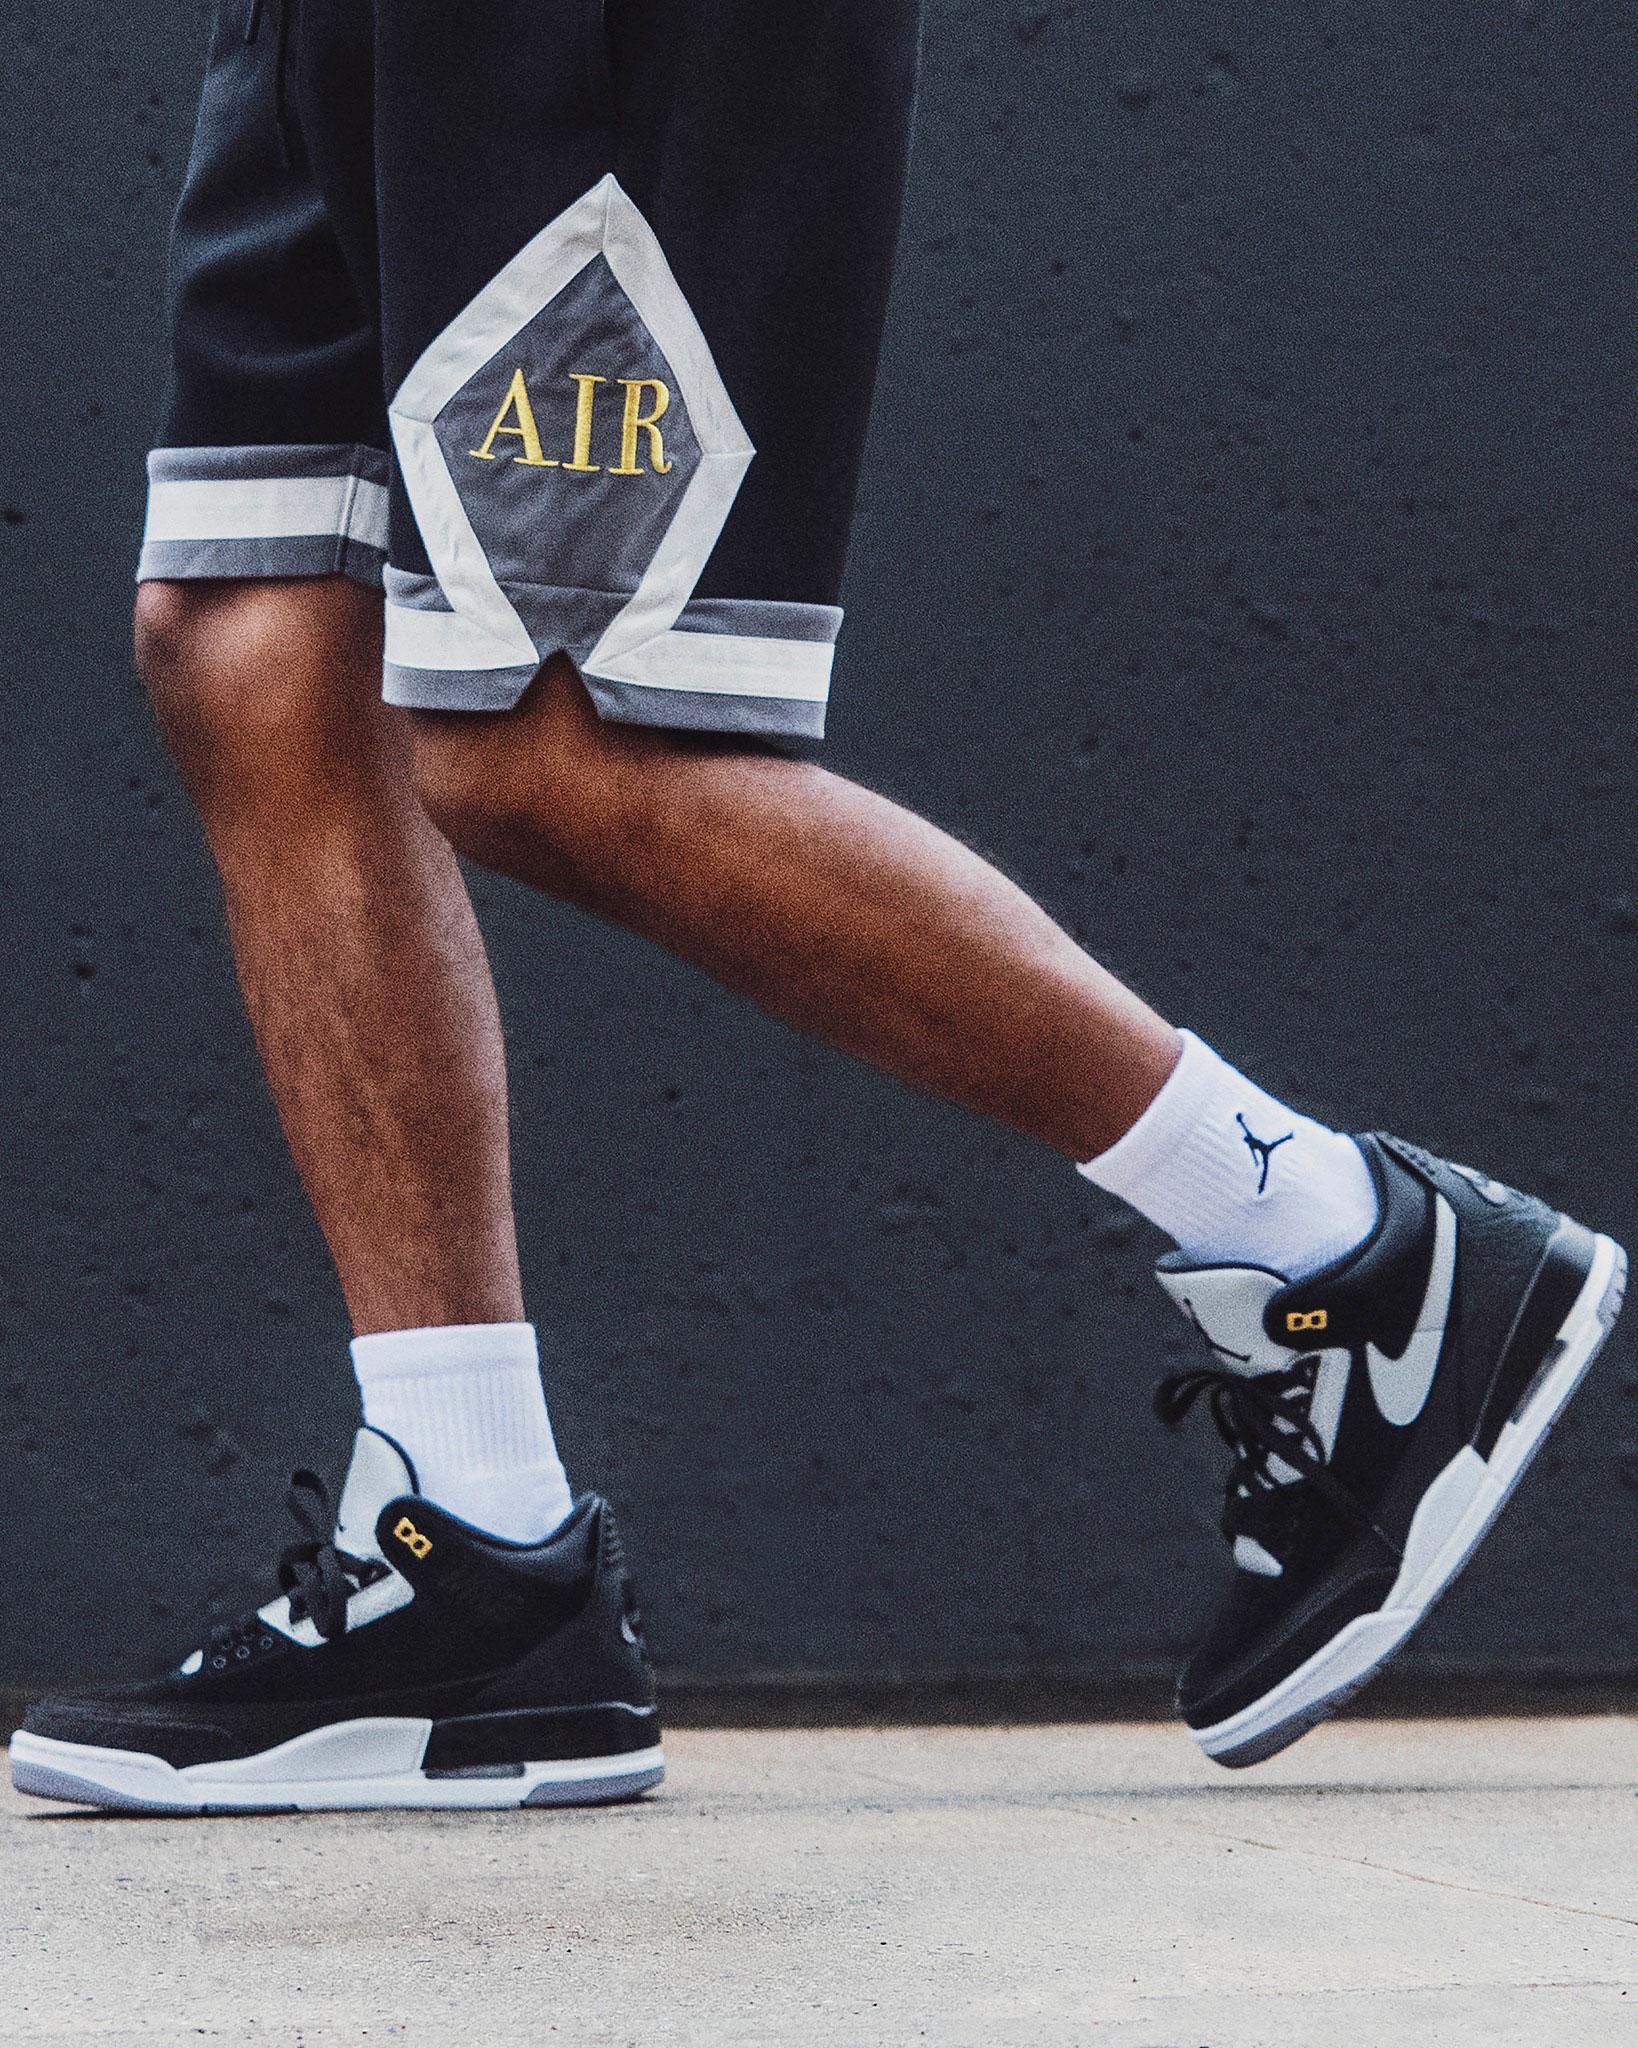 sale retailer 9bb27 ca419 Air Jordan 3 Tinker Black Cement Shorts | SneakerFits.com